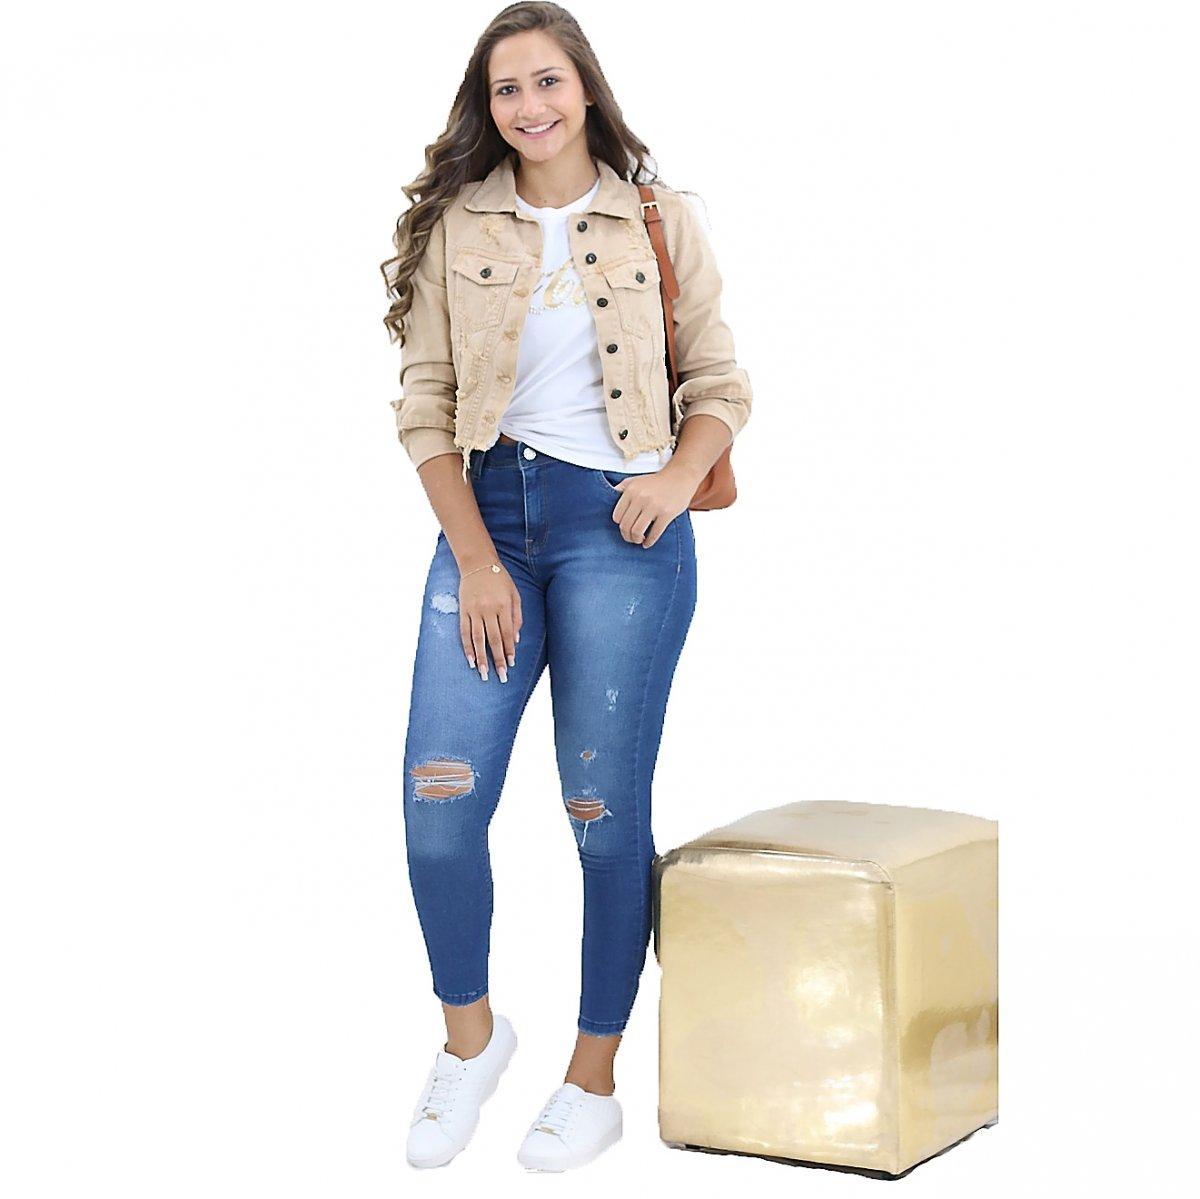 906496bd0b56 Calça Feminina Dardak Jeans Cigarrete Destroyed Jeans - MM Concept